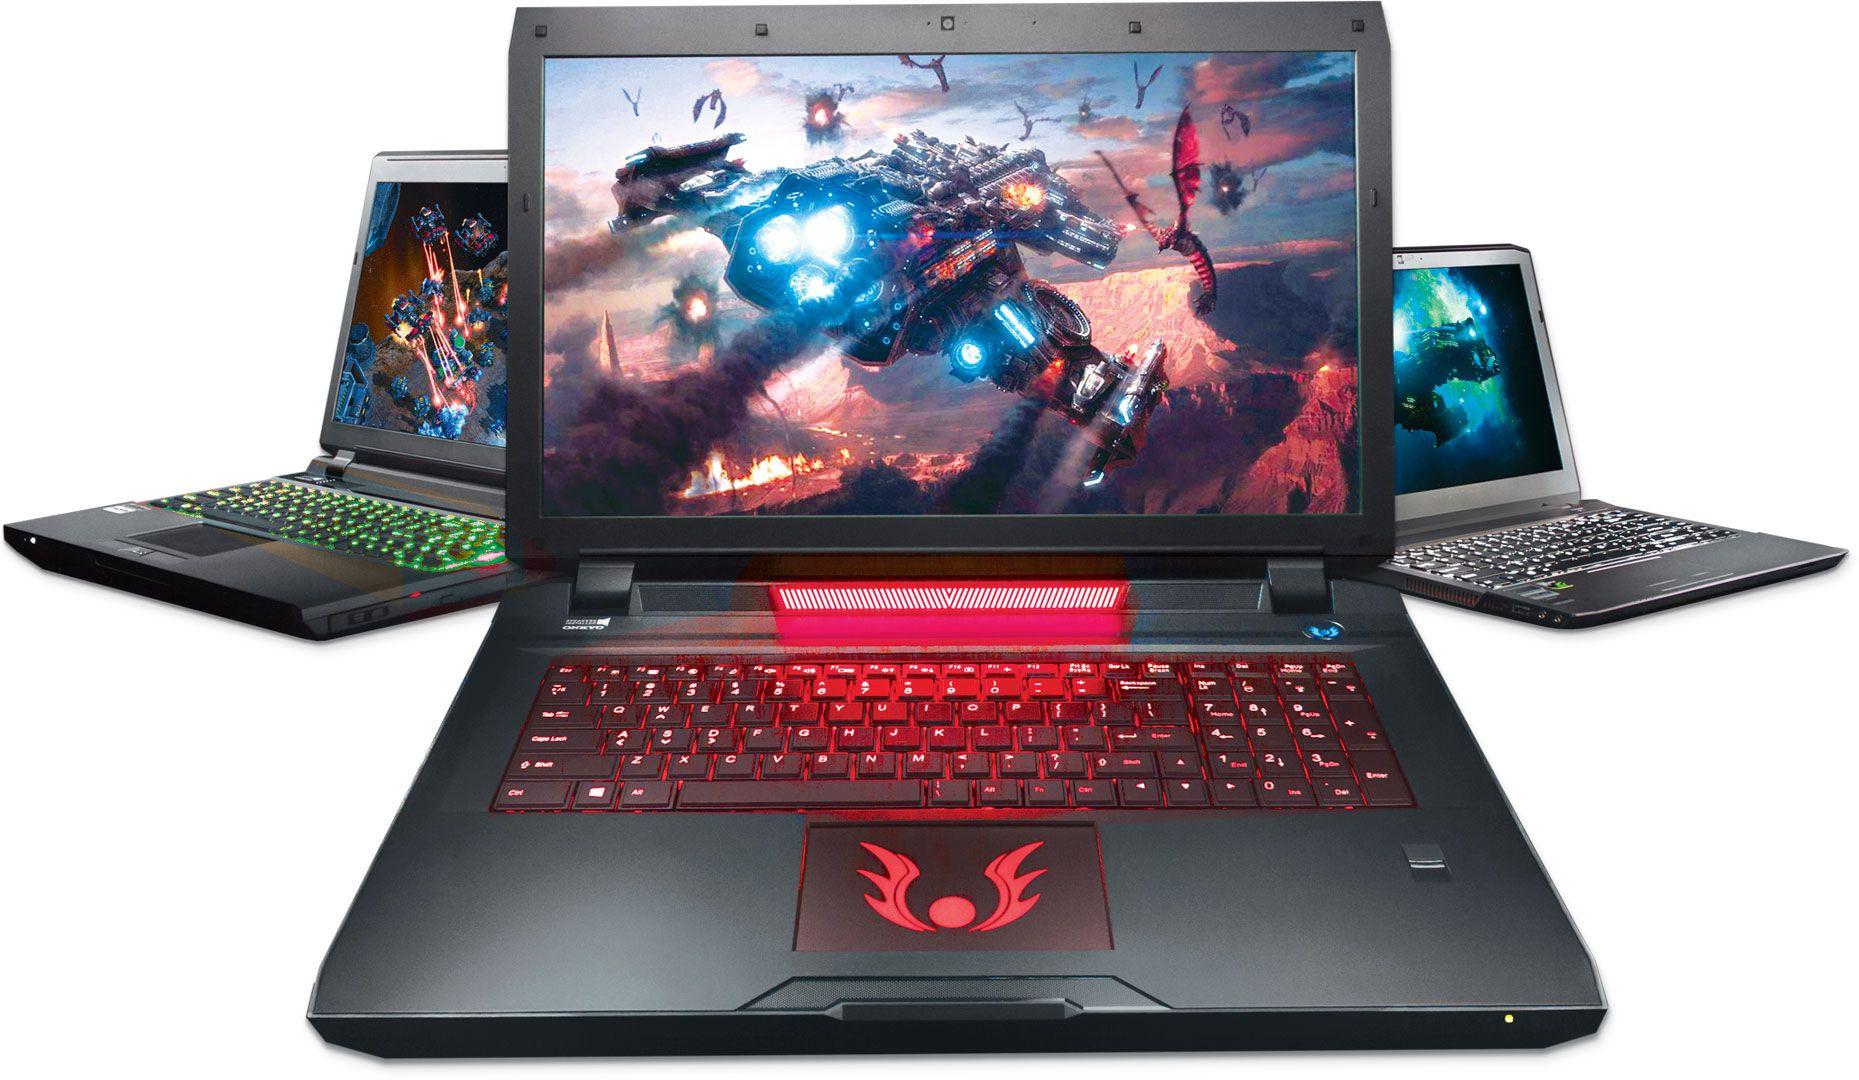 Las tres laptops mejores para gamers.  #gamerlaptop #poder #videojuegos #nuevas #soriana #geek #hotsale